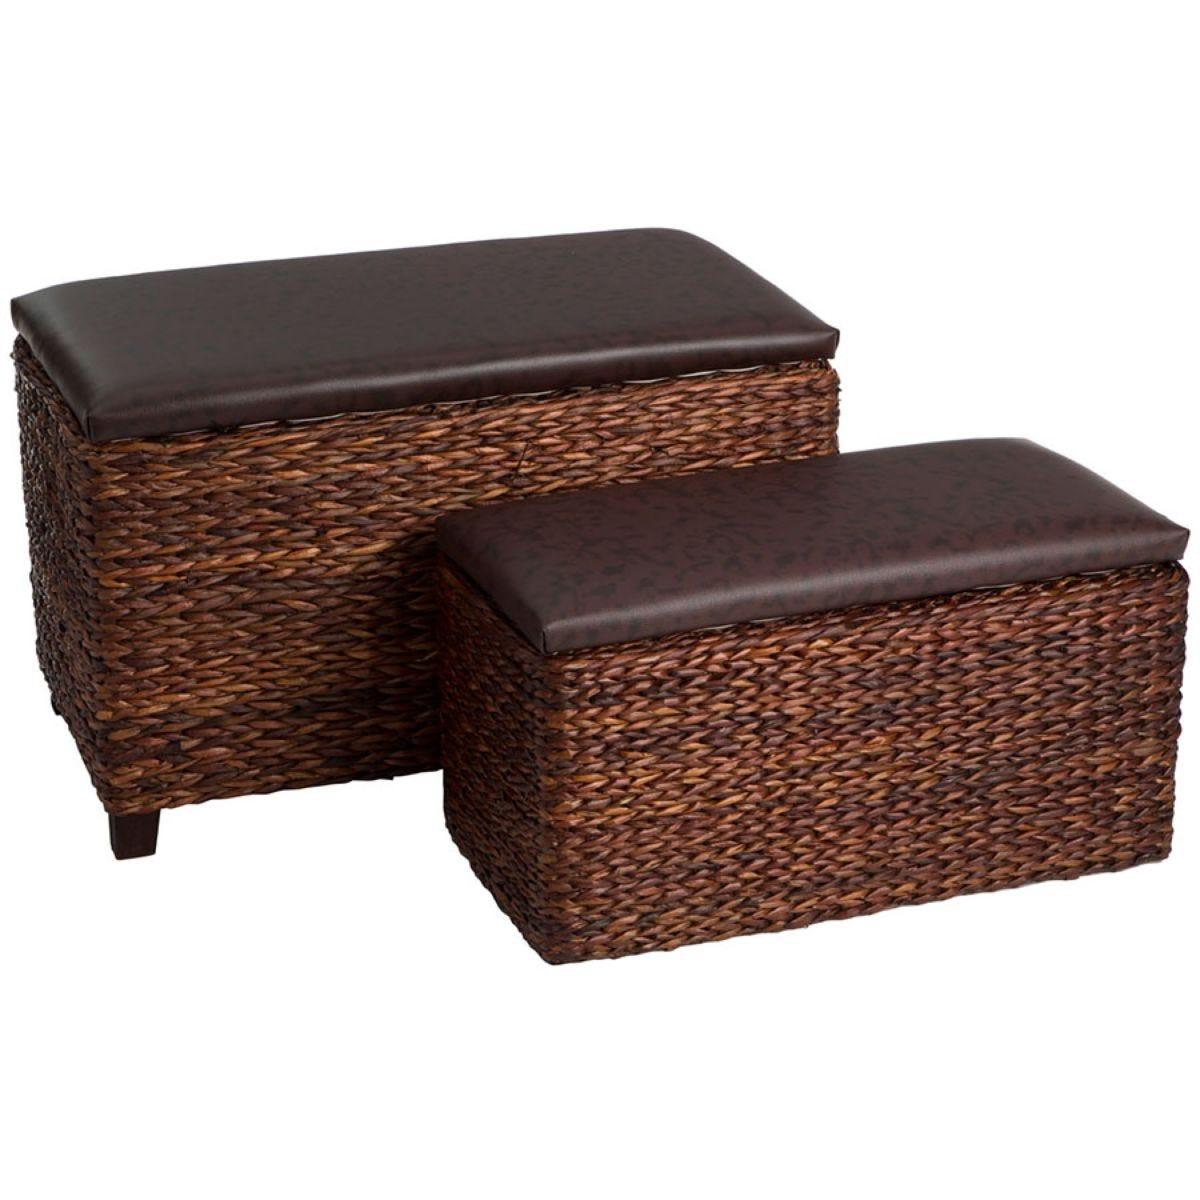 Premier Housewares Ottoman Storage Set of 2 - Cattail Leaf/Brown Leather